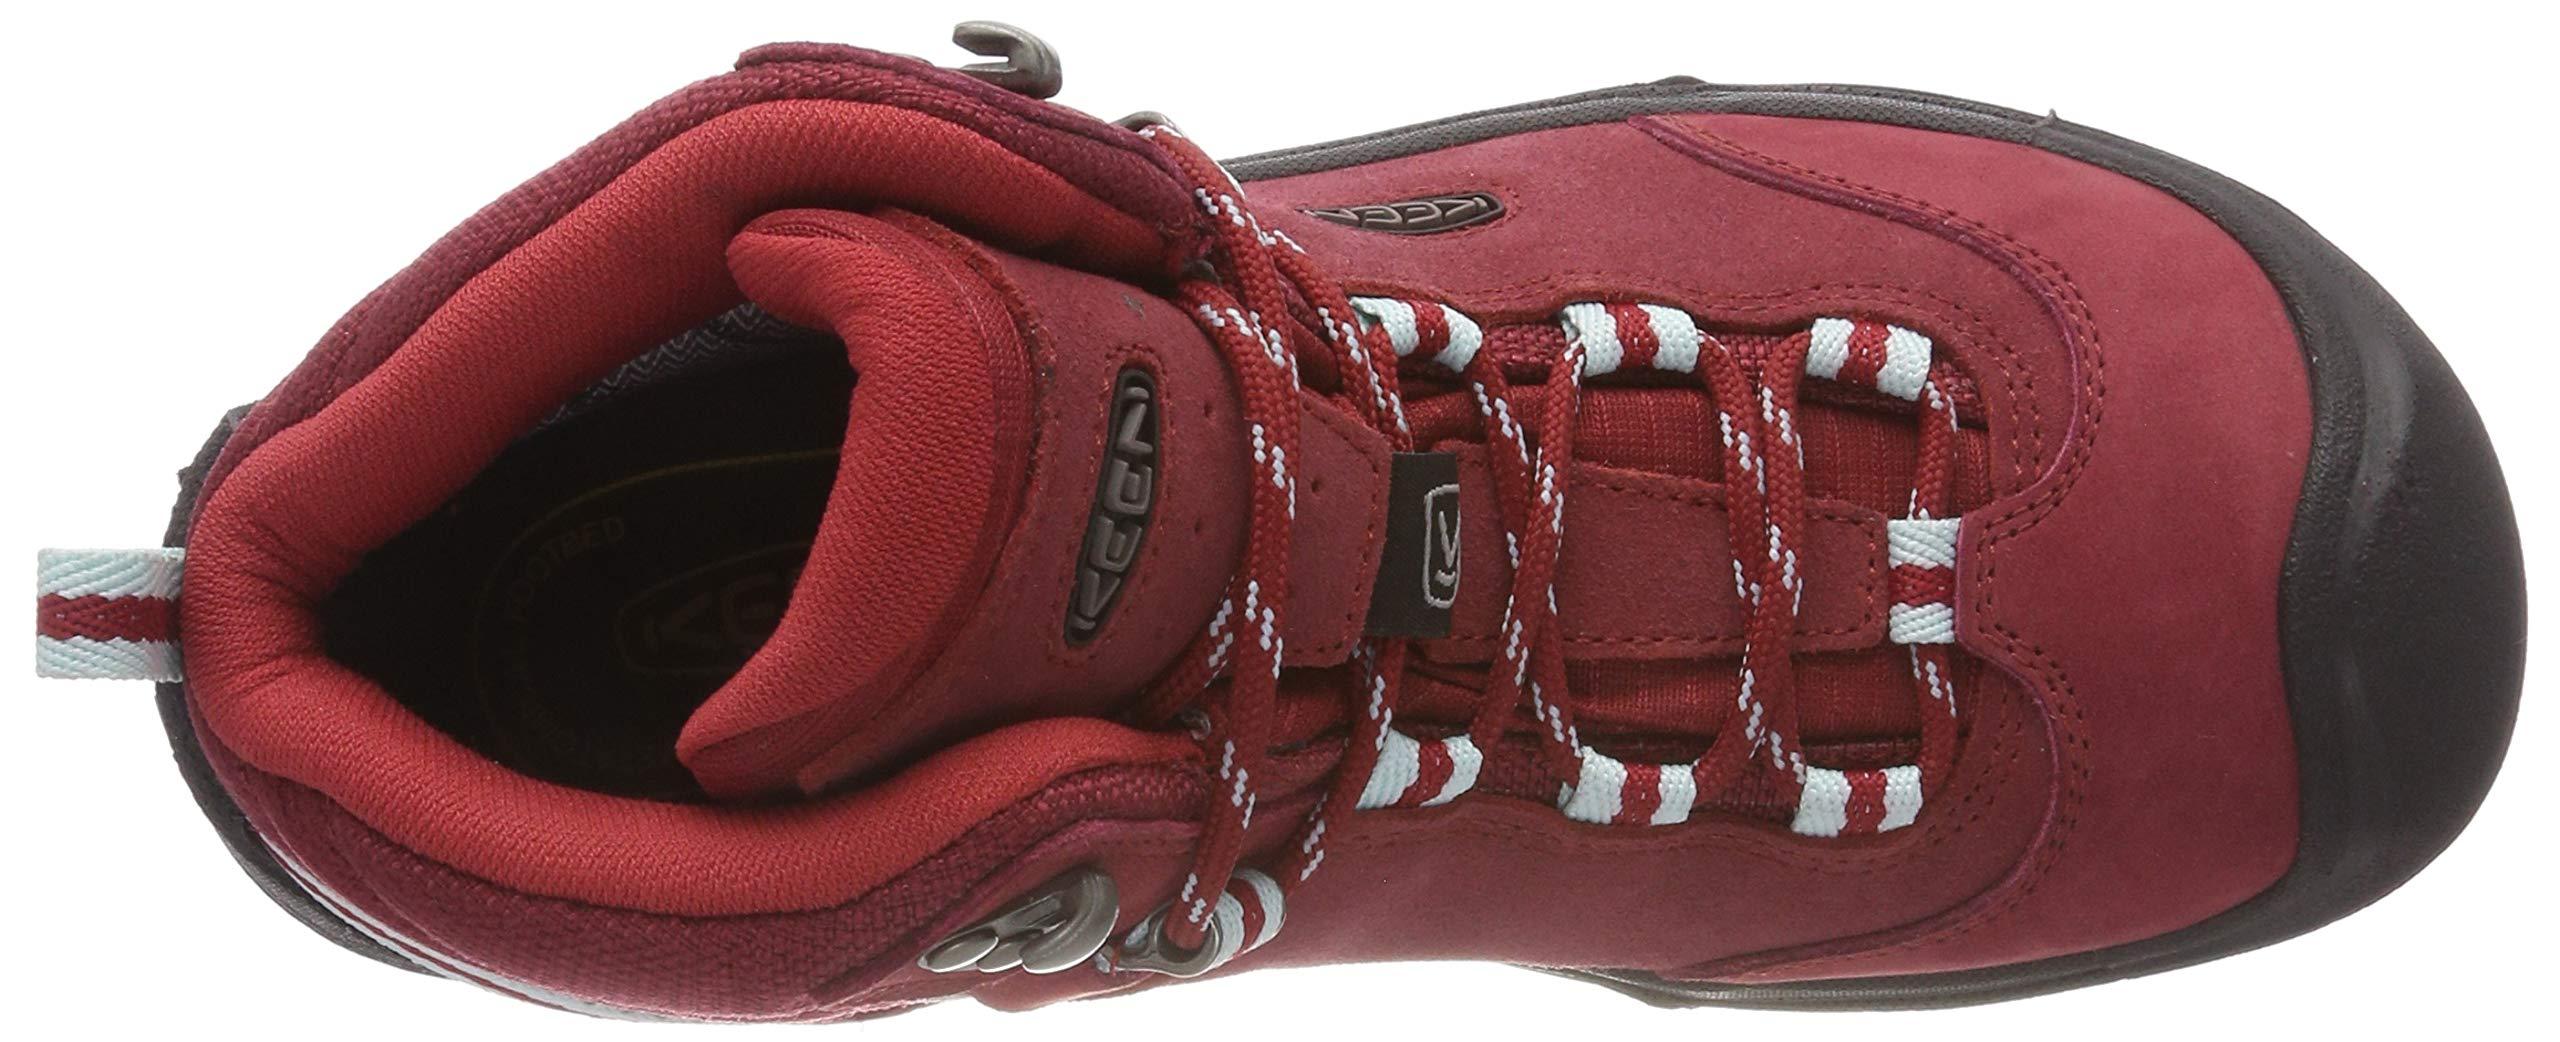 KEEN Women's Wanderer Waterproof Mid High Rise Hiking Shoes, 8.5 UK 7